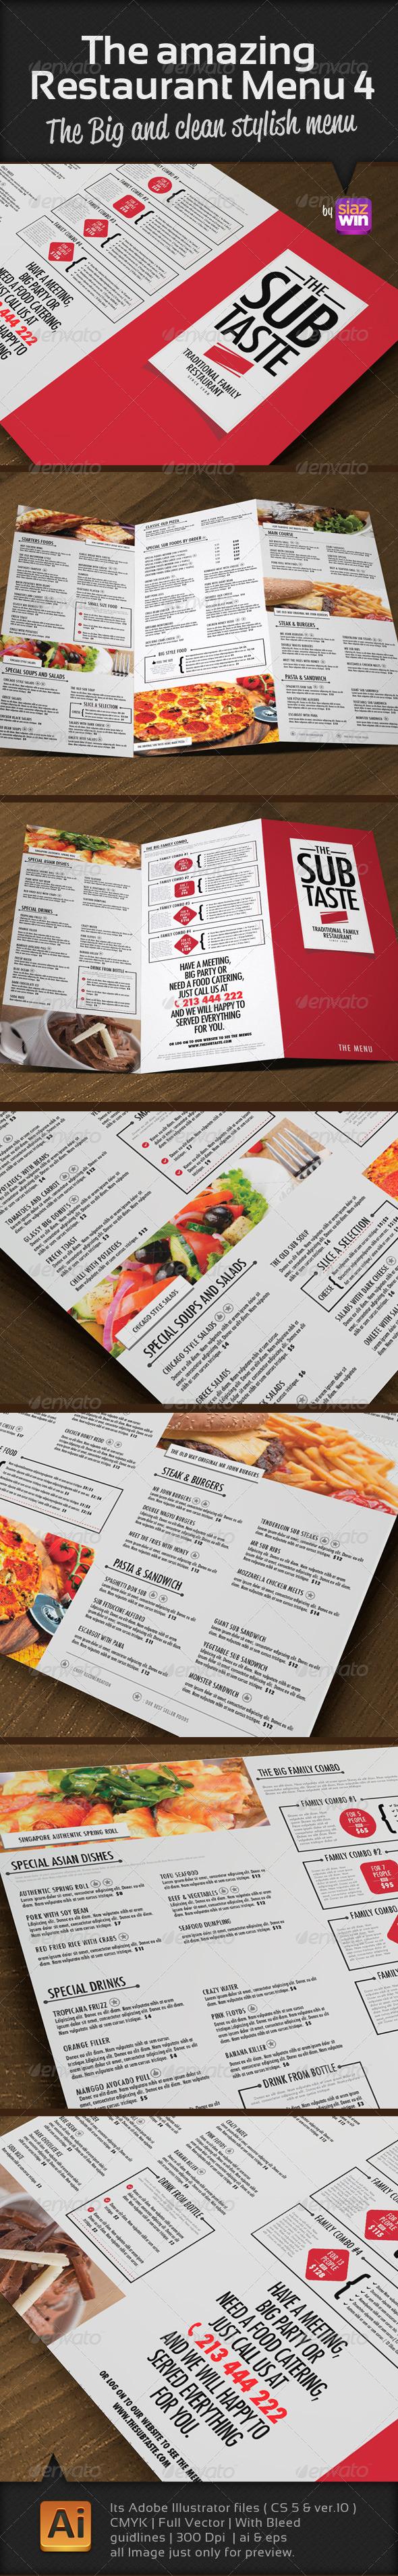 GraphicRiver The Amazing Restaurant Menu 4